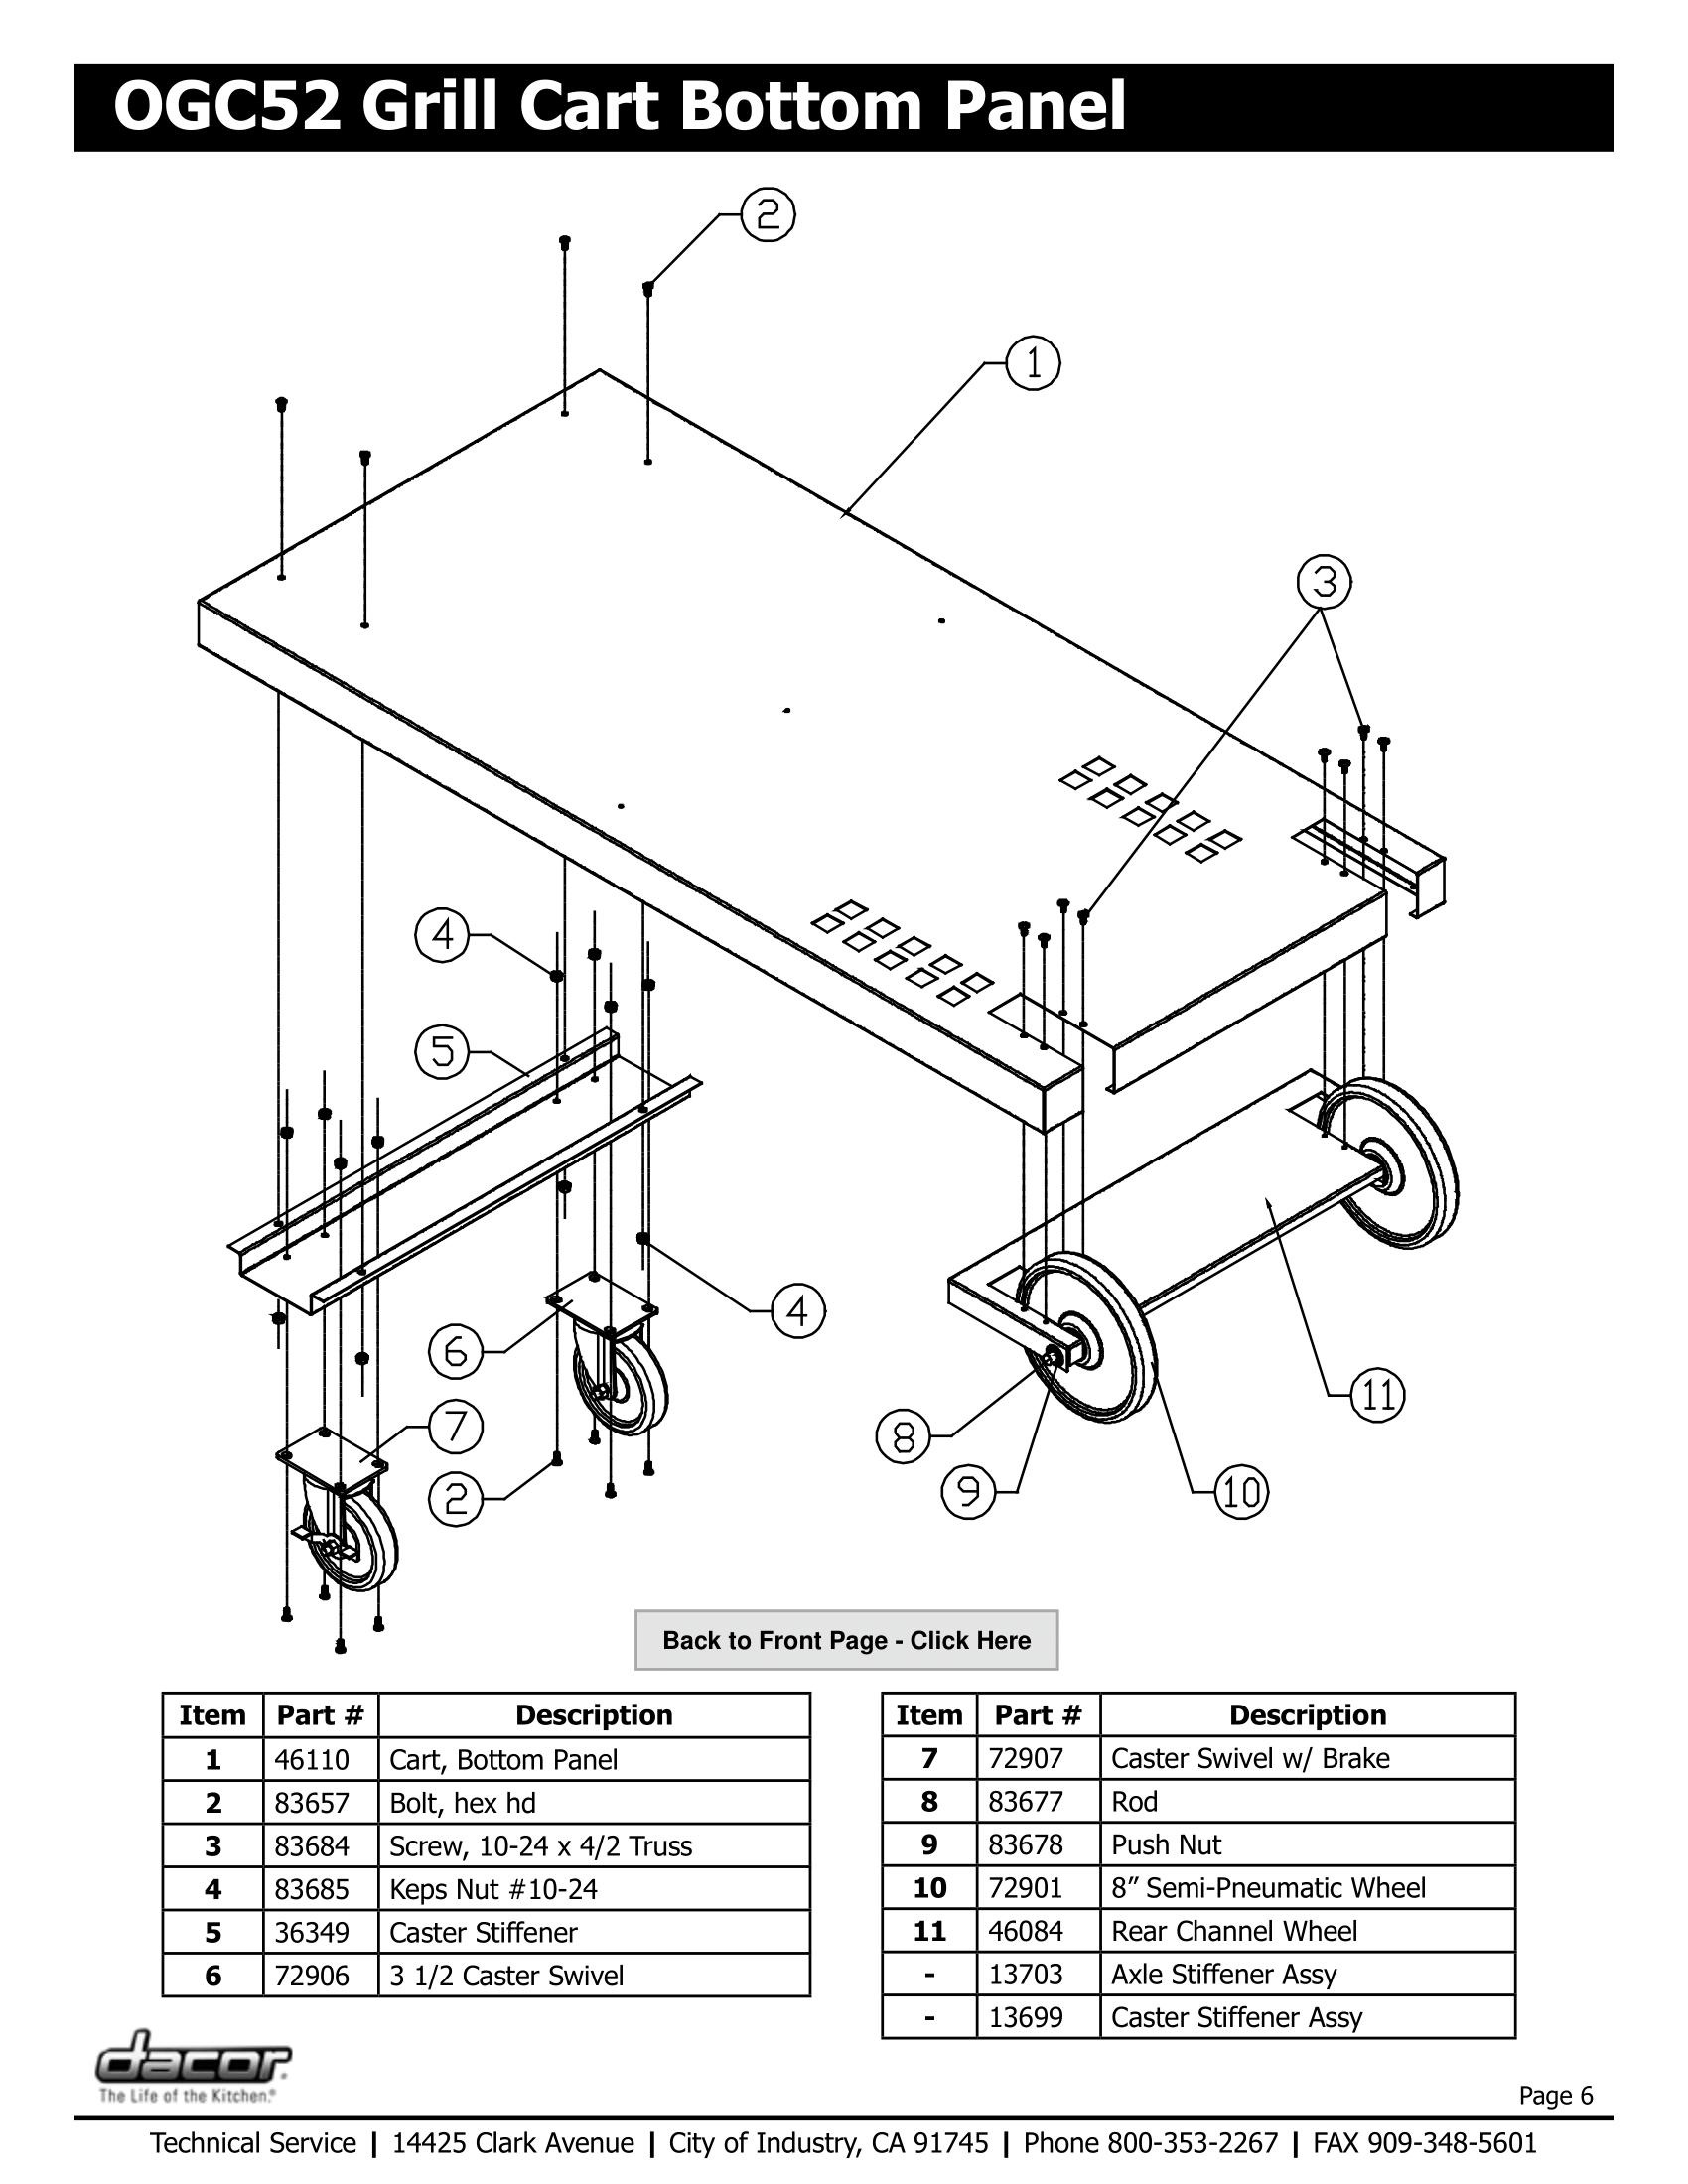 Dacor OGC52 Bottom Panel Schematic